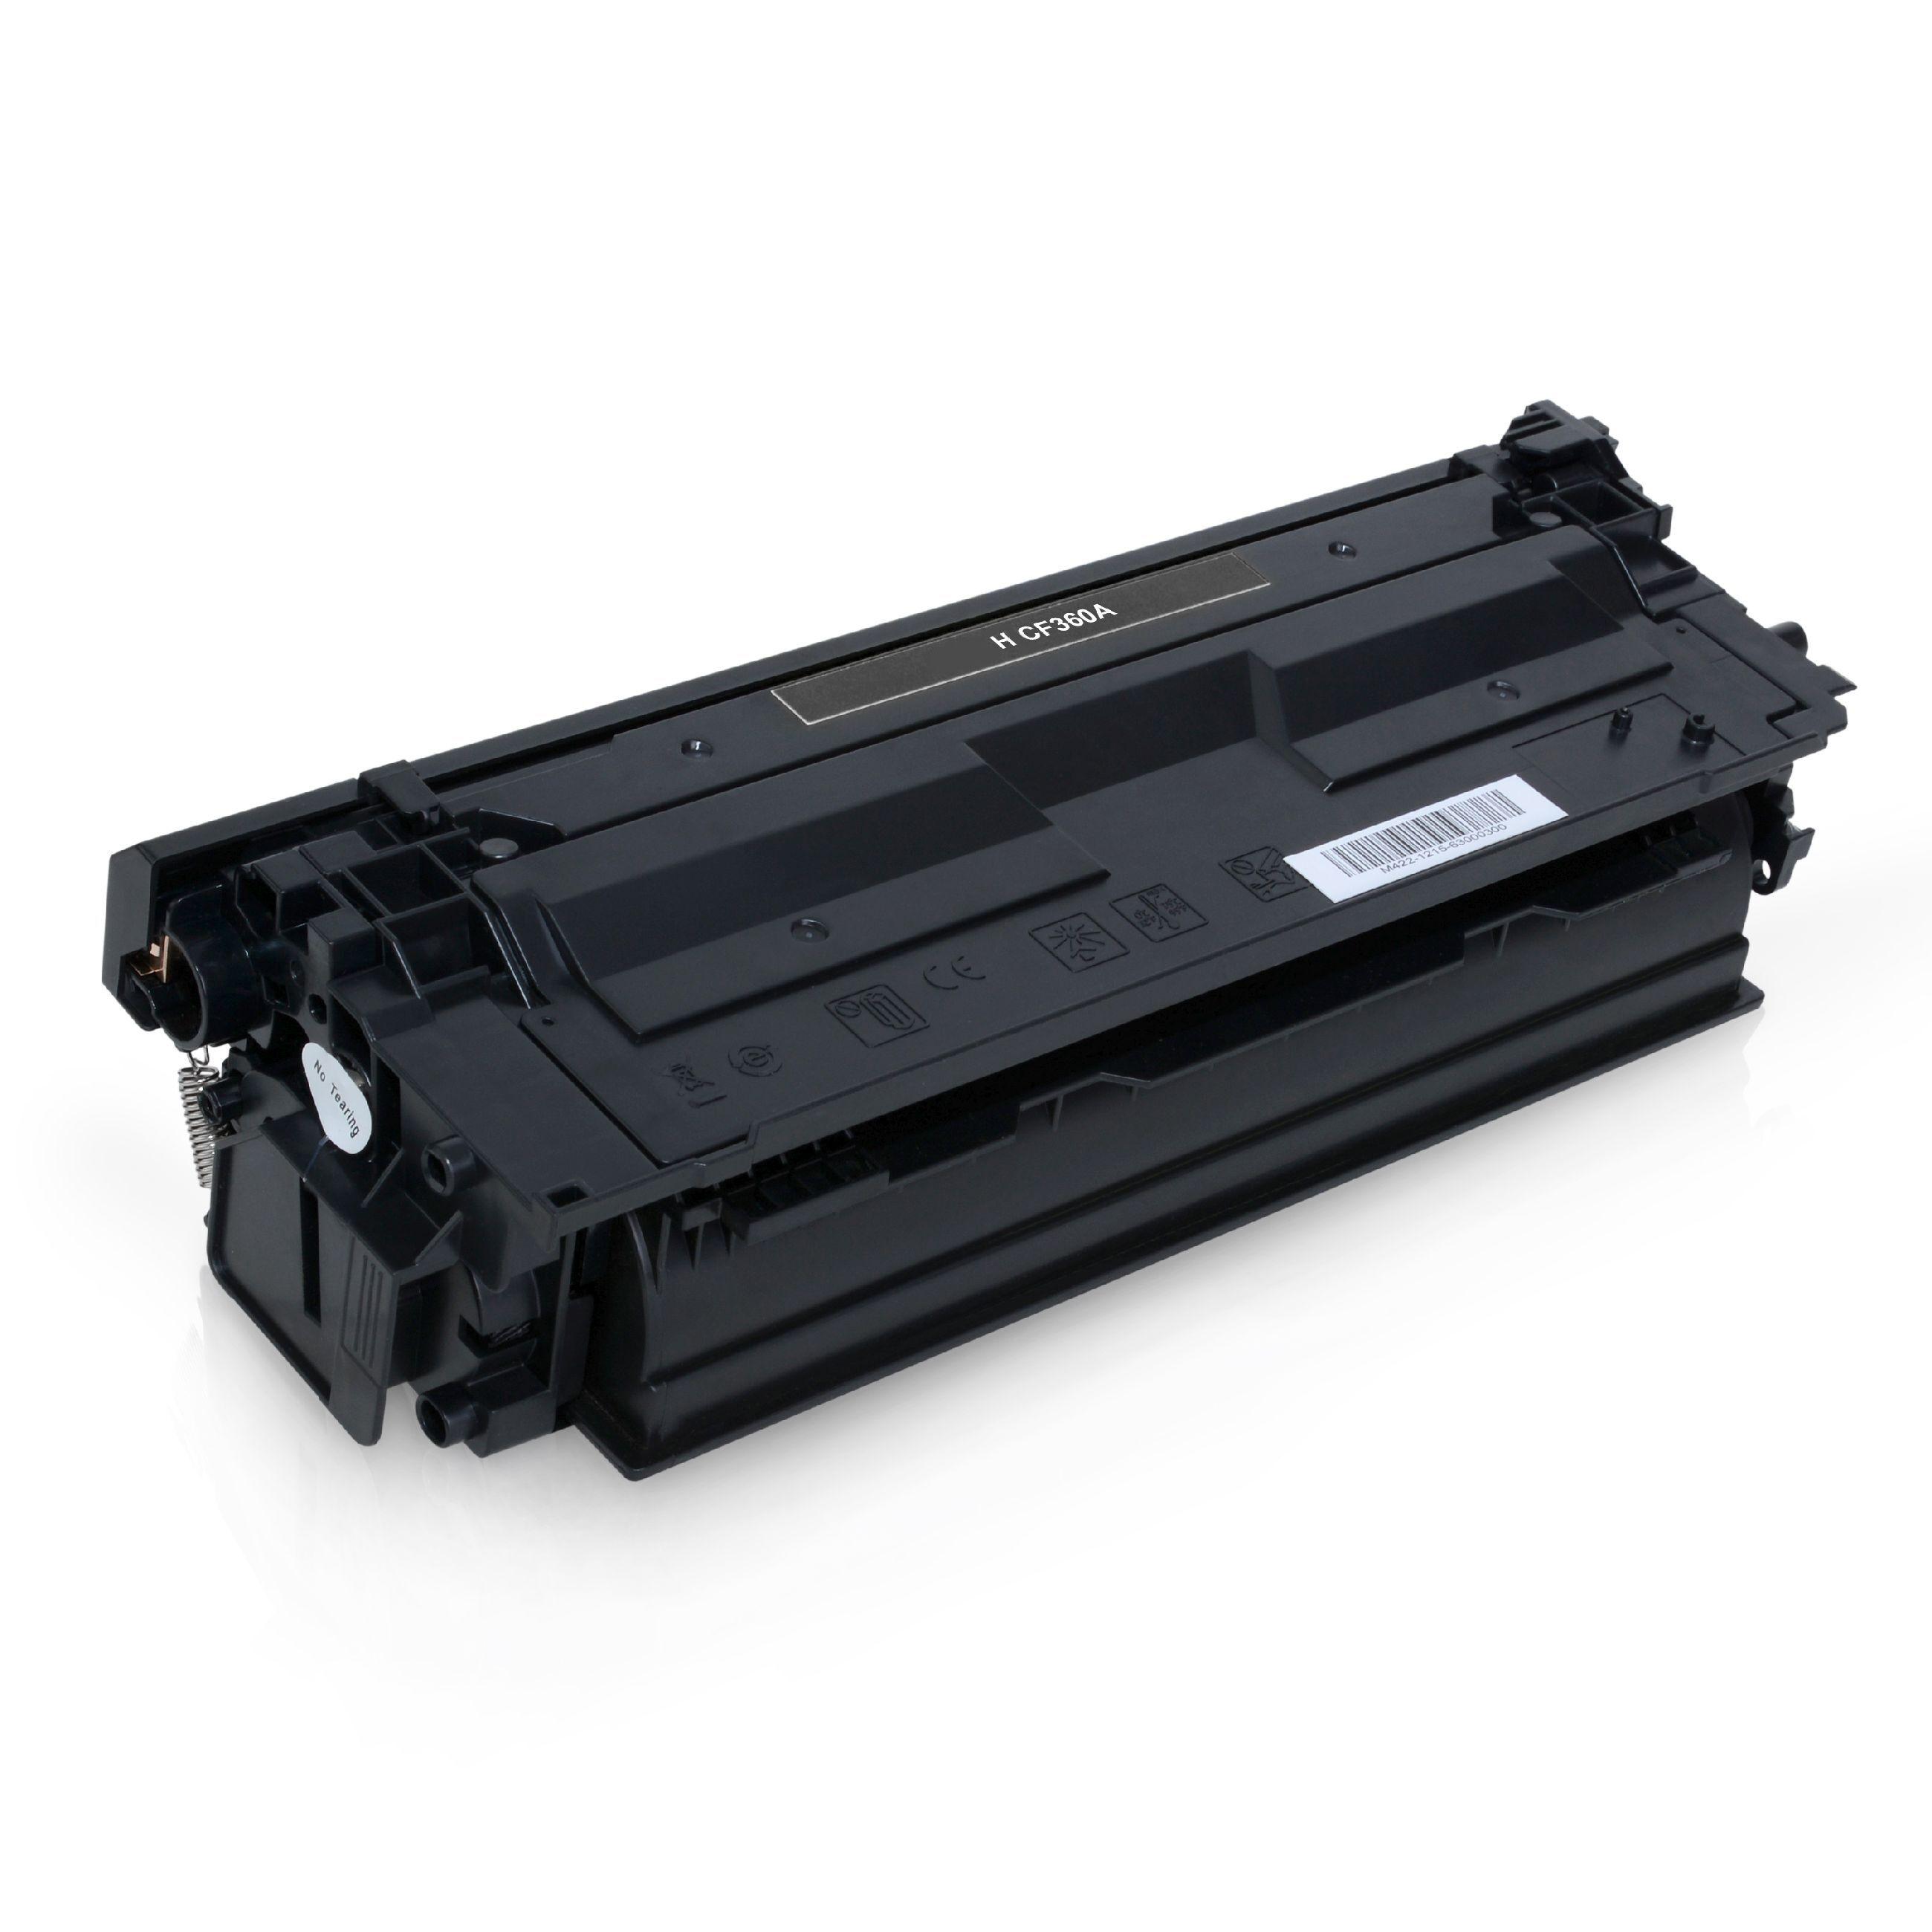 HP Cartouche de Toner pour HP CF360A / 508A noir compatible (de marque ASC)